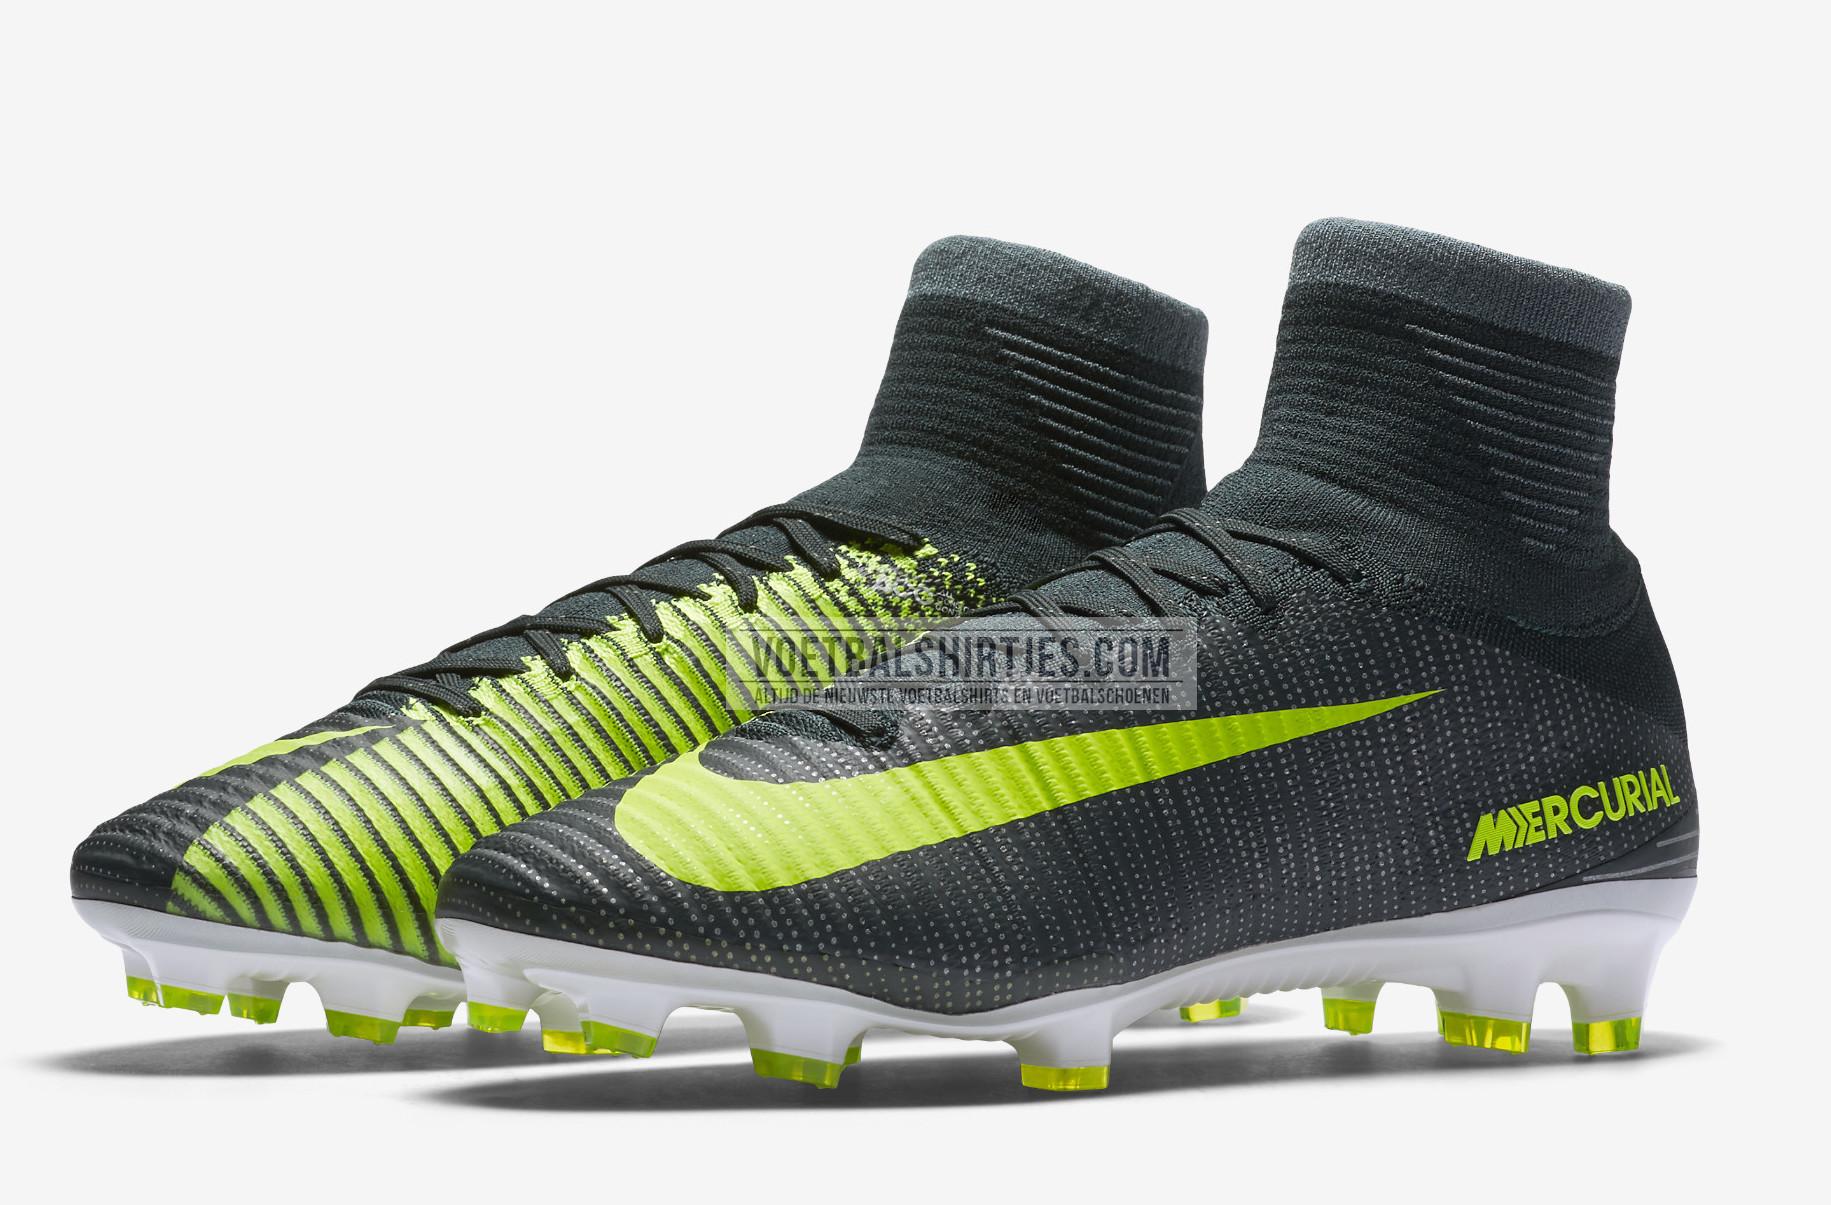 Nike CR7 Mercurial Superfly